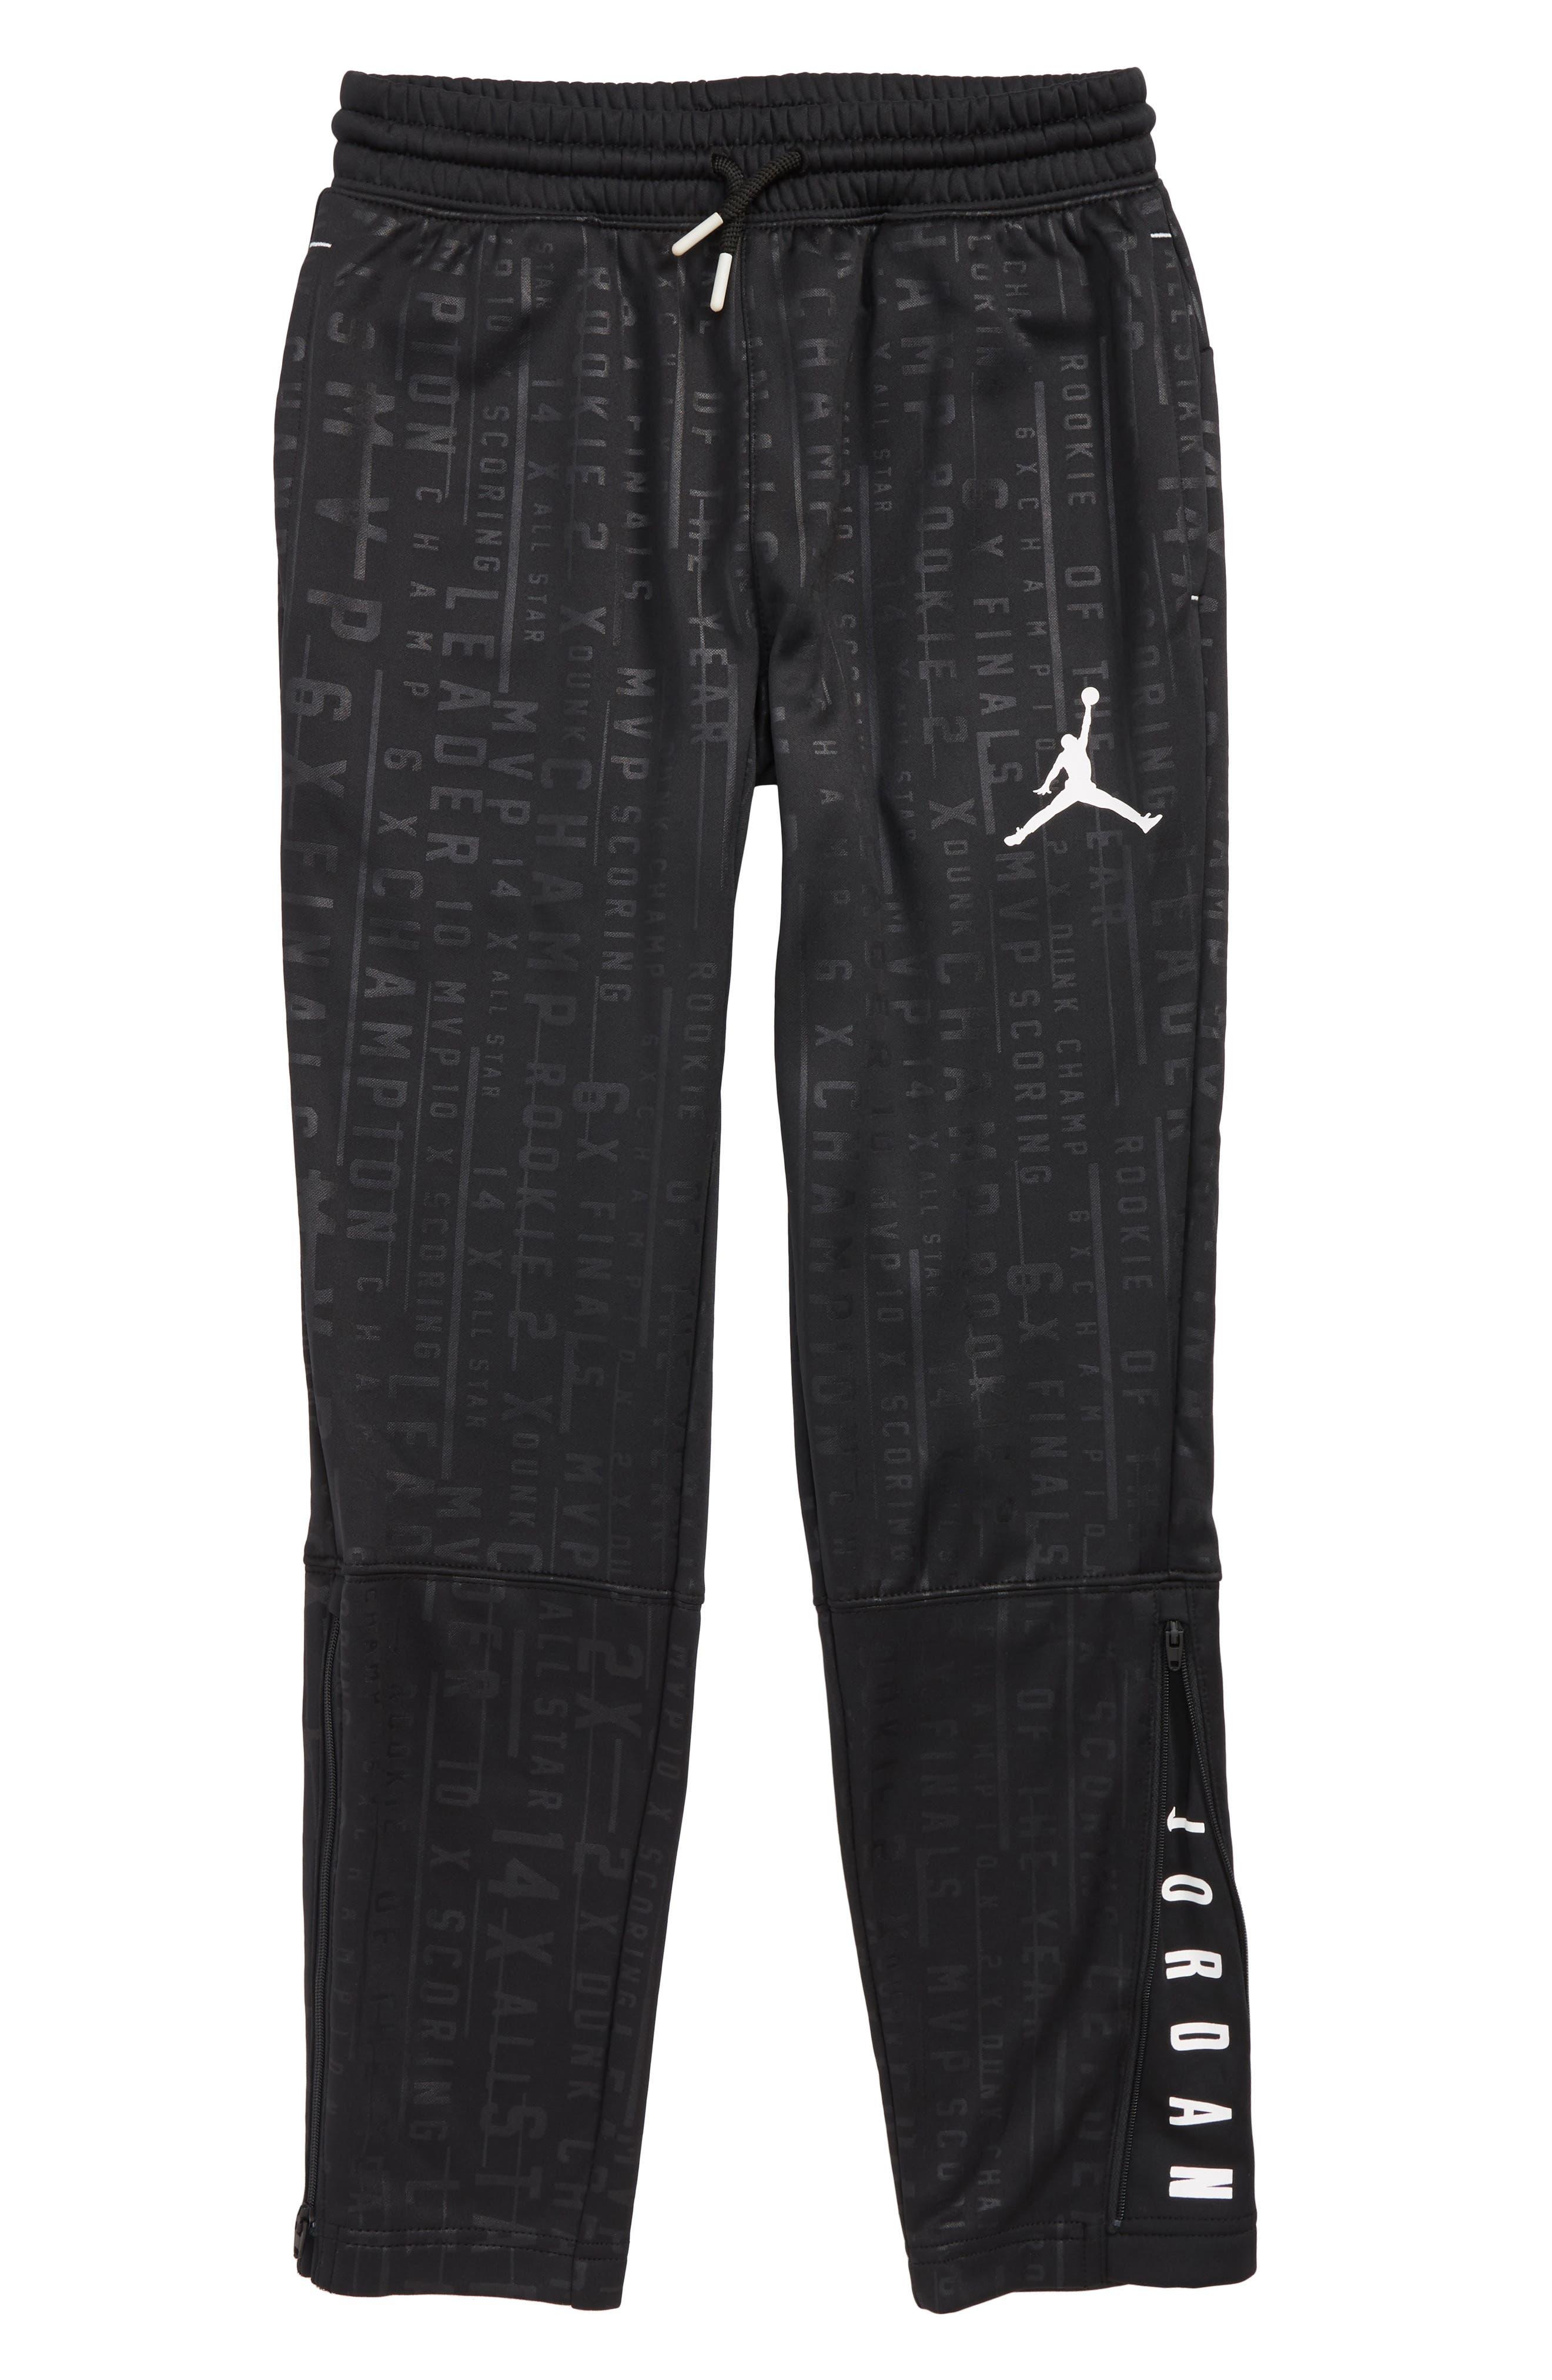 Jordan Tech Accolades Pants,                             Main thumbnail 1, color,                             001